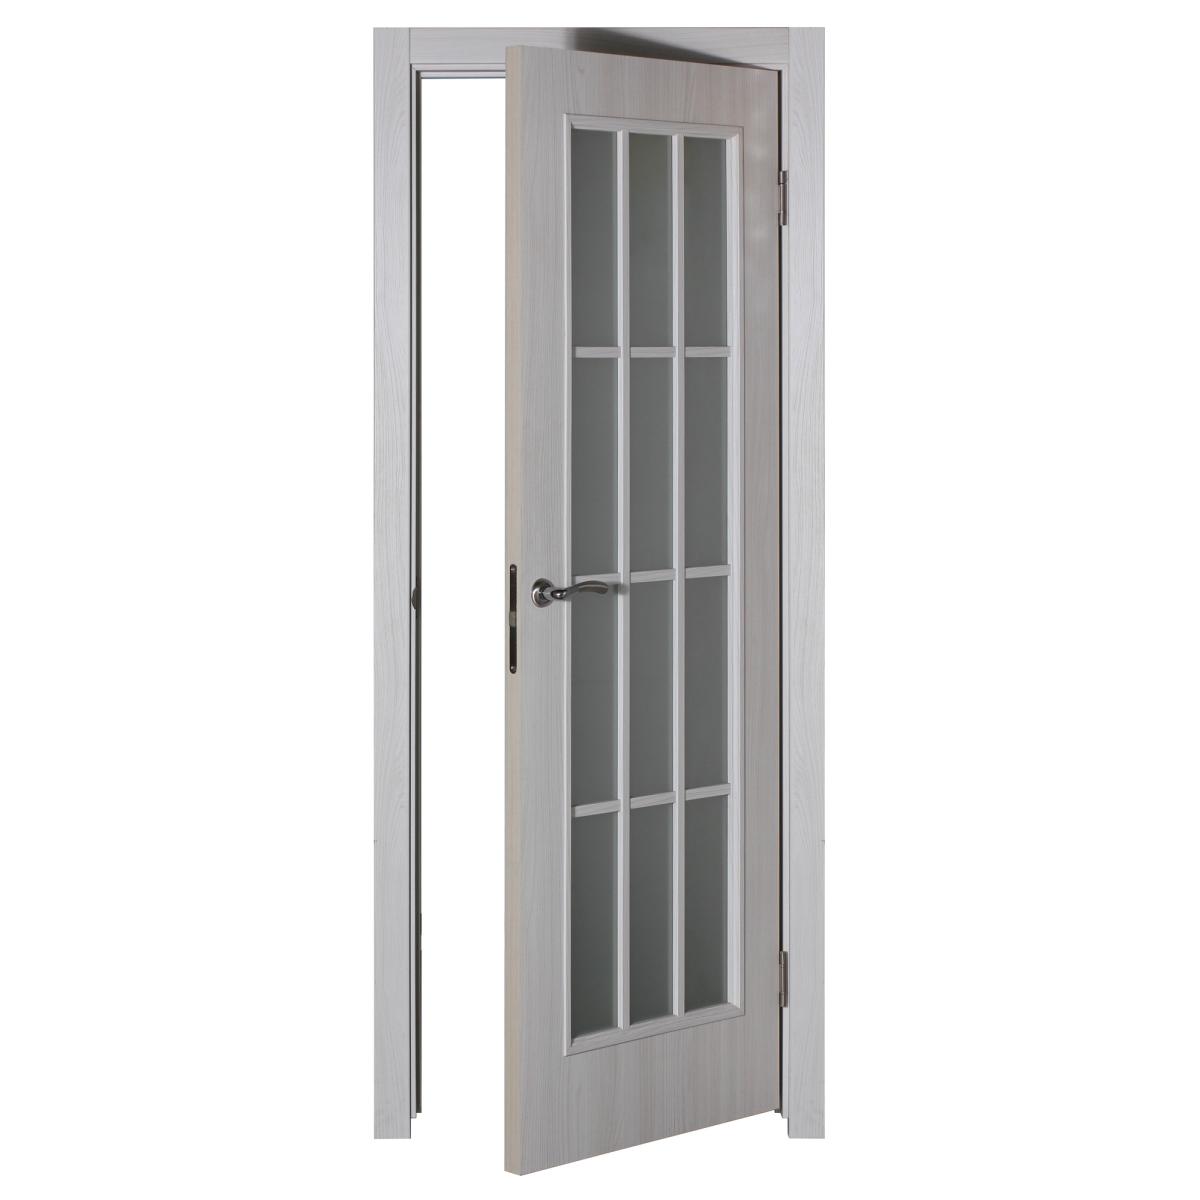 Дверь Межкомнатная Остеклённая Провенца 70x200 Цвет